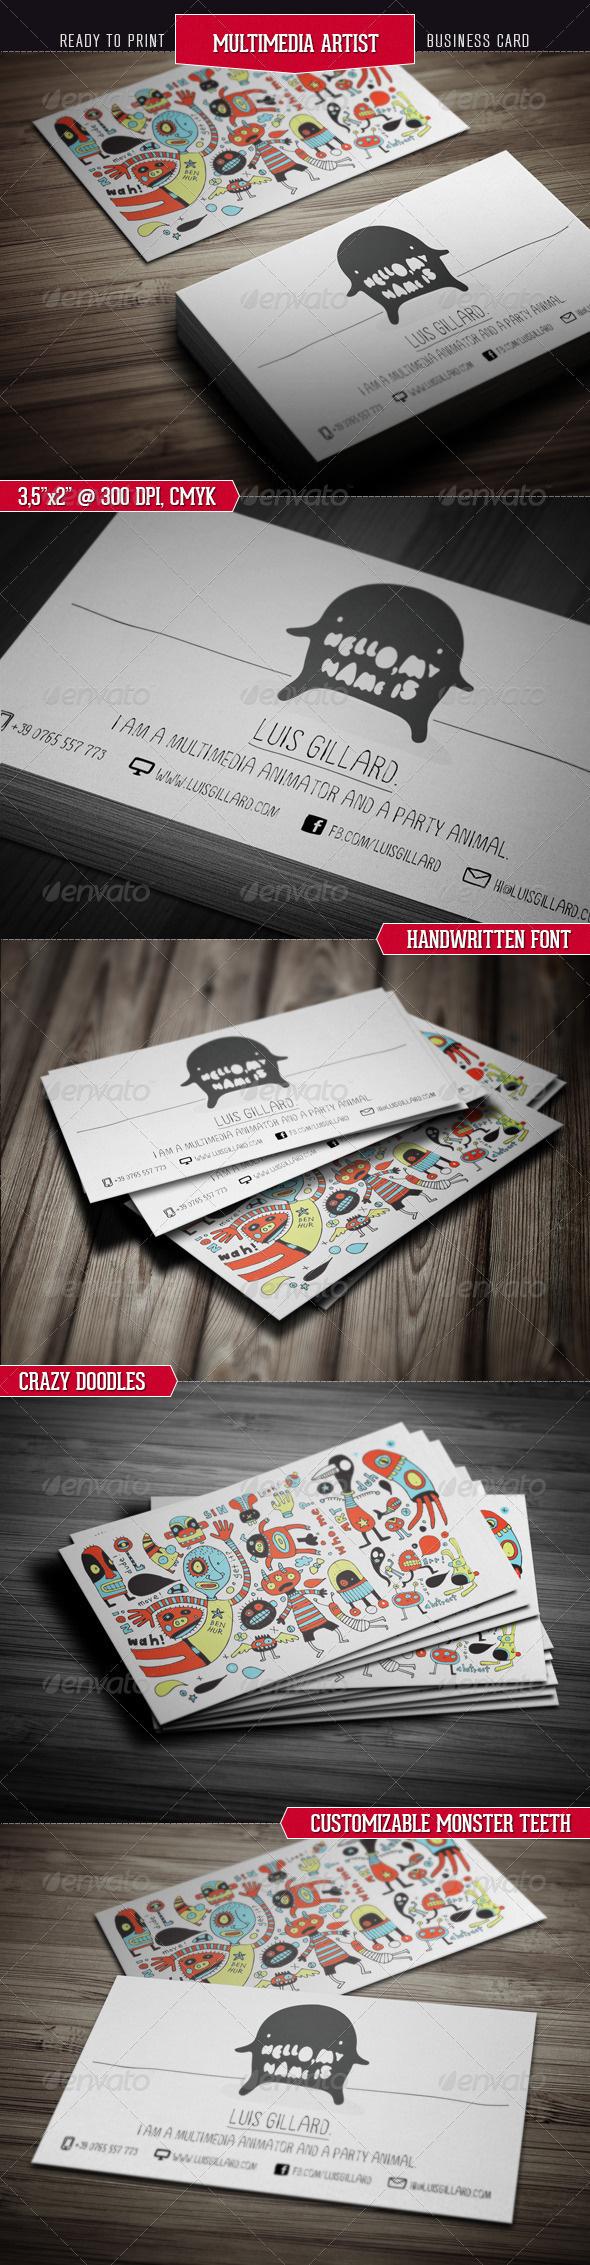 ThemeFlava #business #multimedia #card #print #illustration #artist